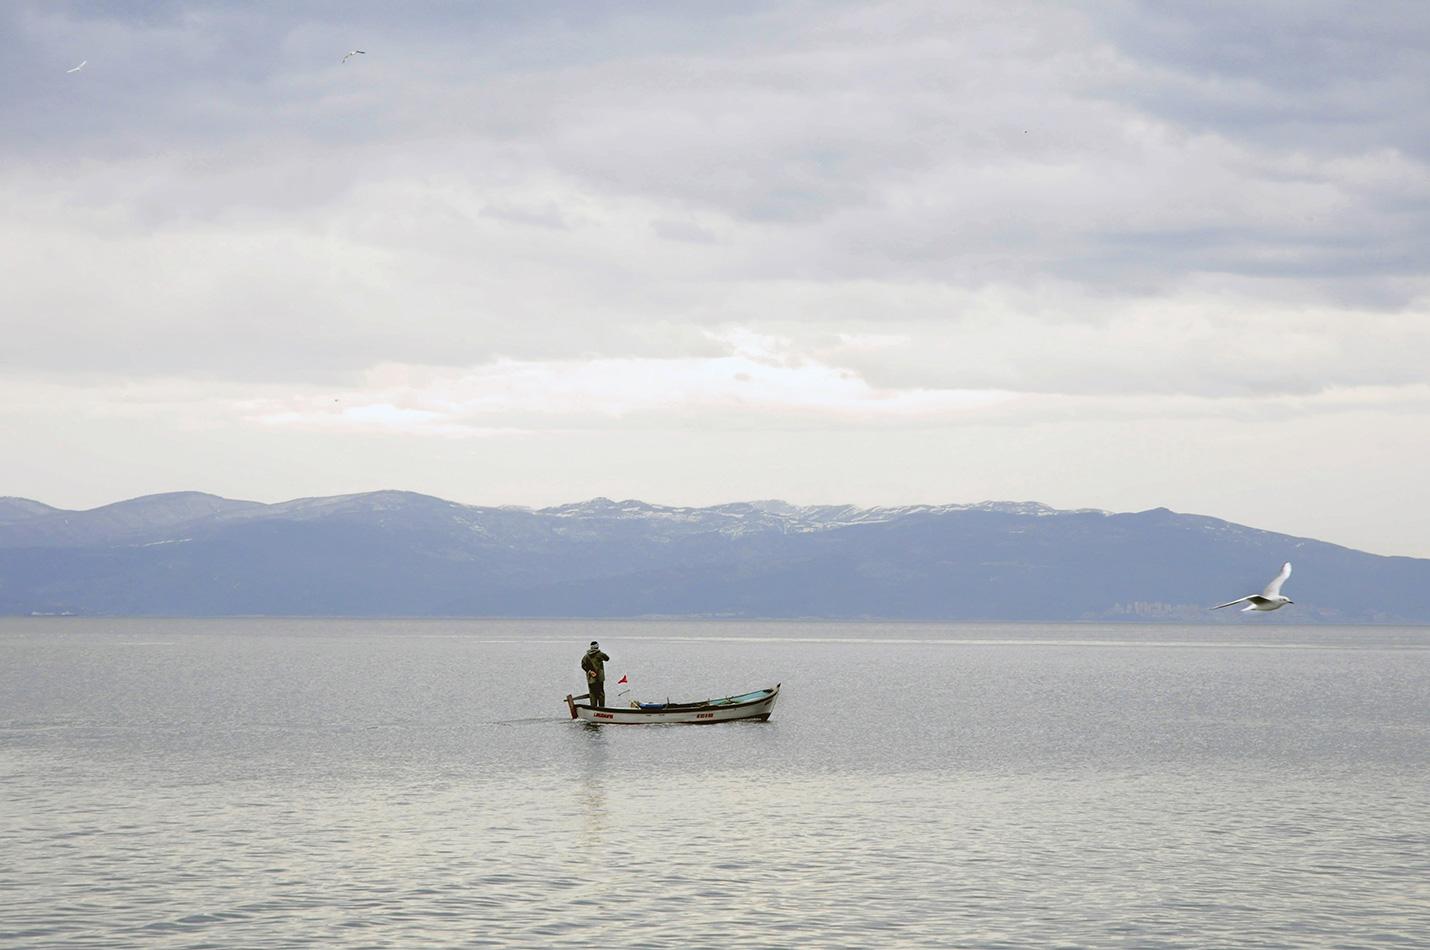 Mart 2011 - Mudanya sahilinden - Engin Çakır